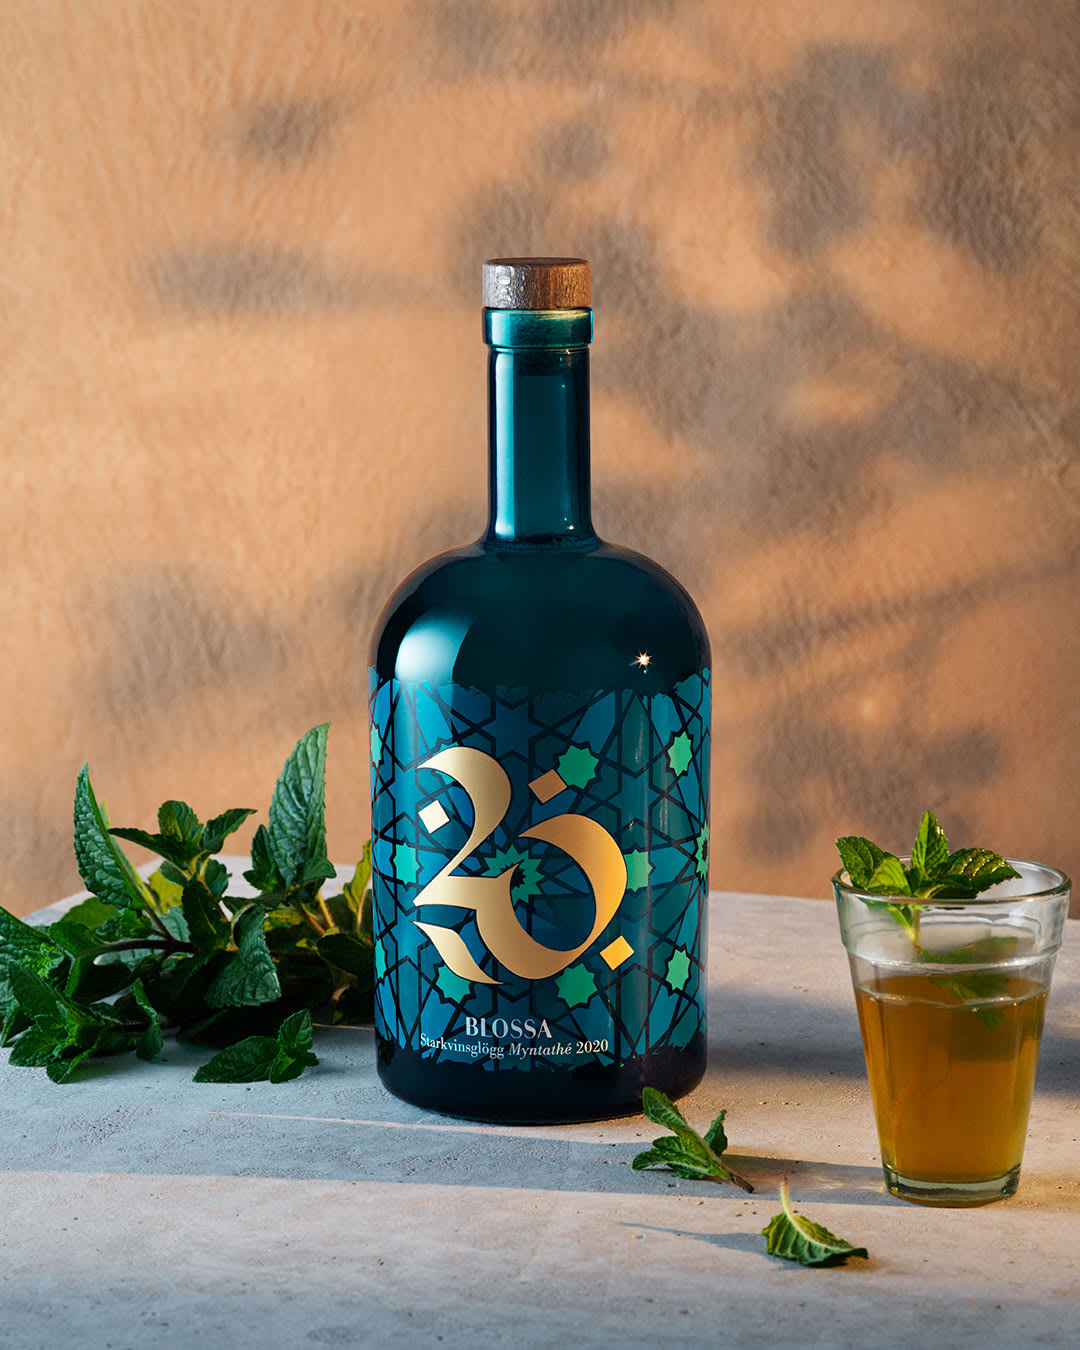 Blossa myntathe 2020 bottle and drink